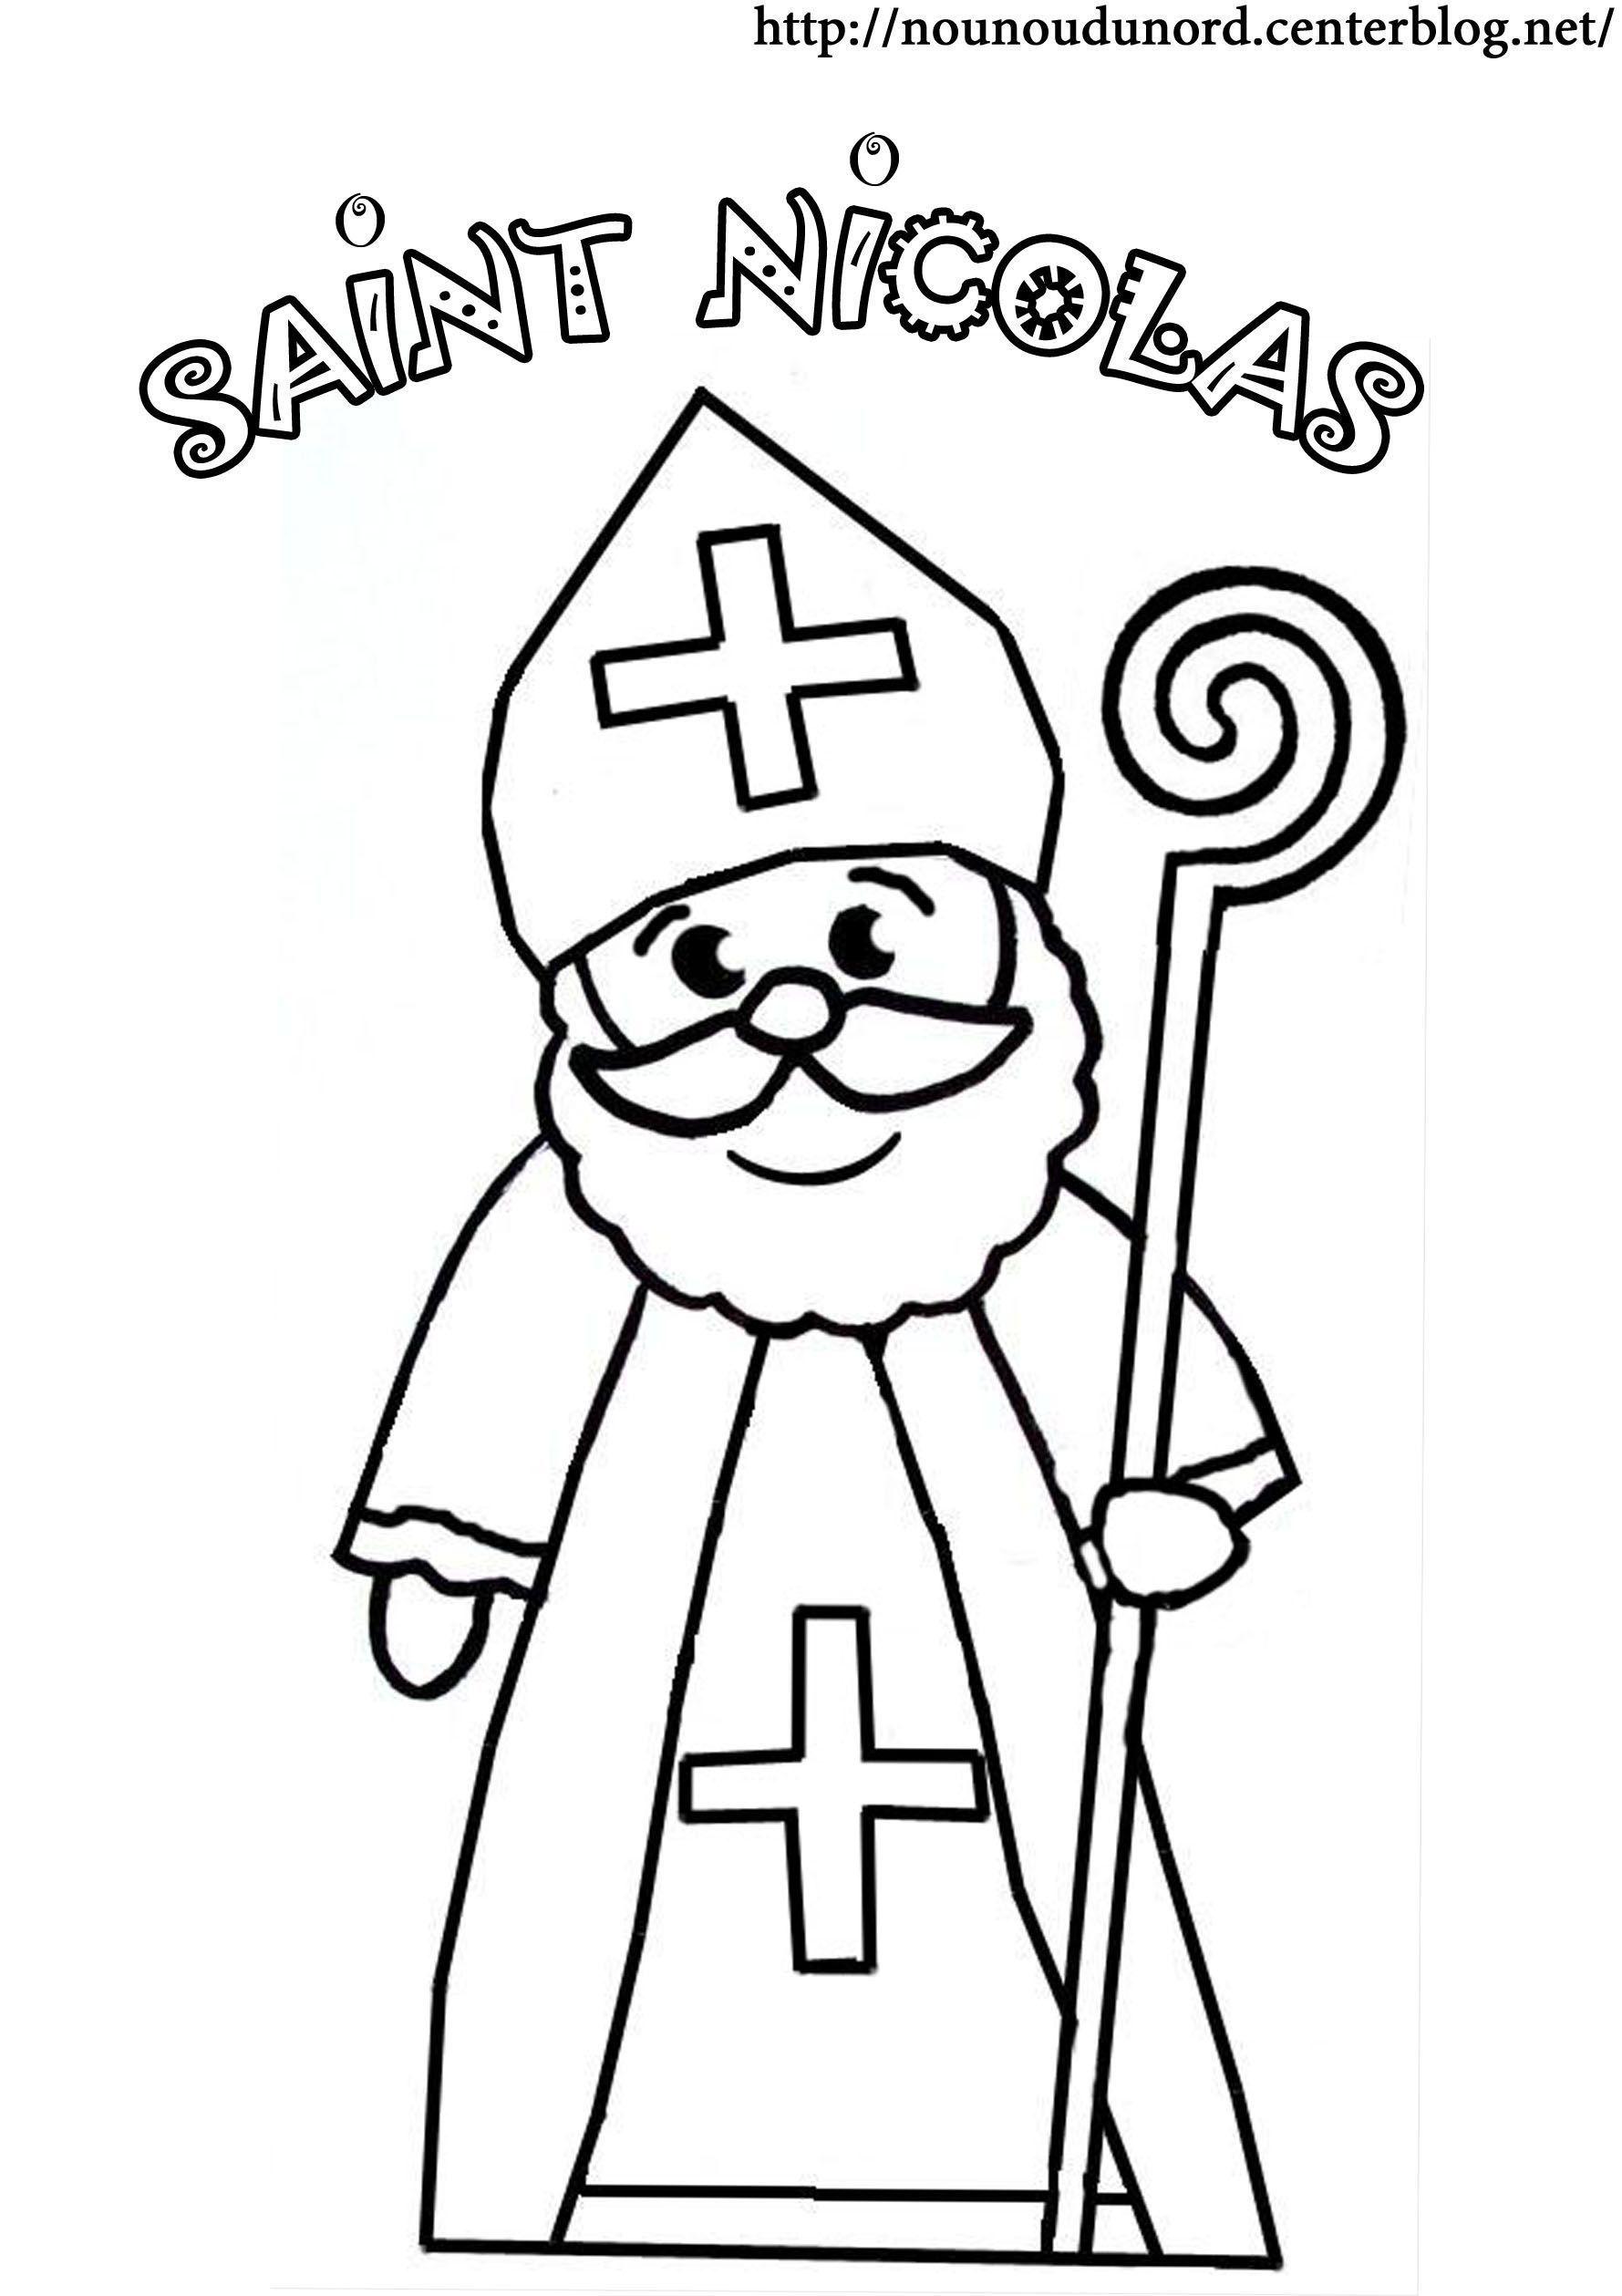 Coloriage saint nicolas - Image de saint nicolas a imprimer ...